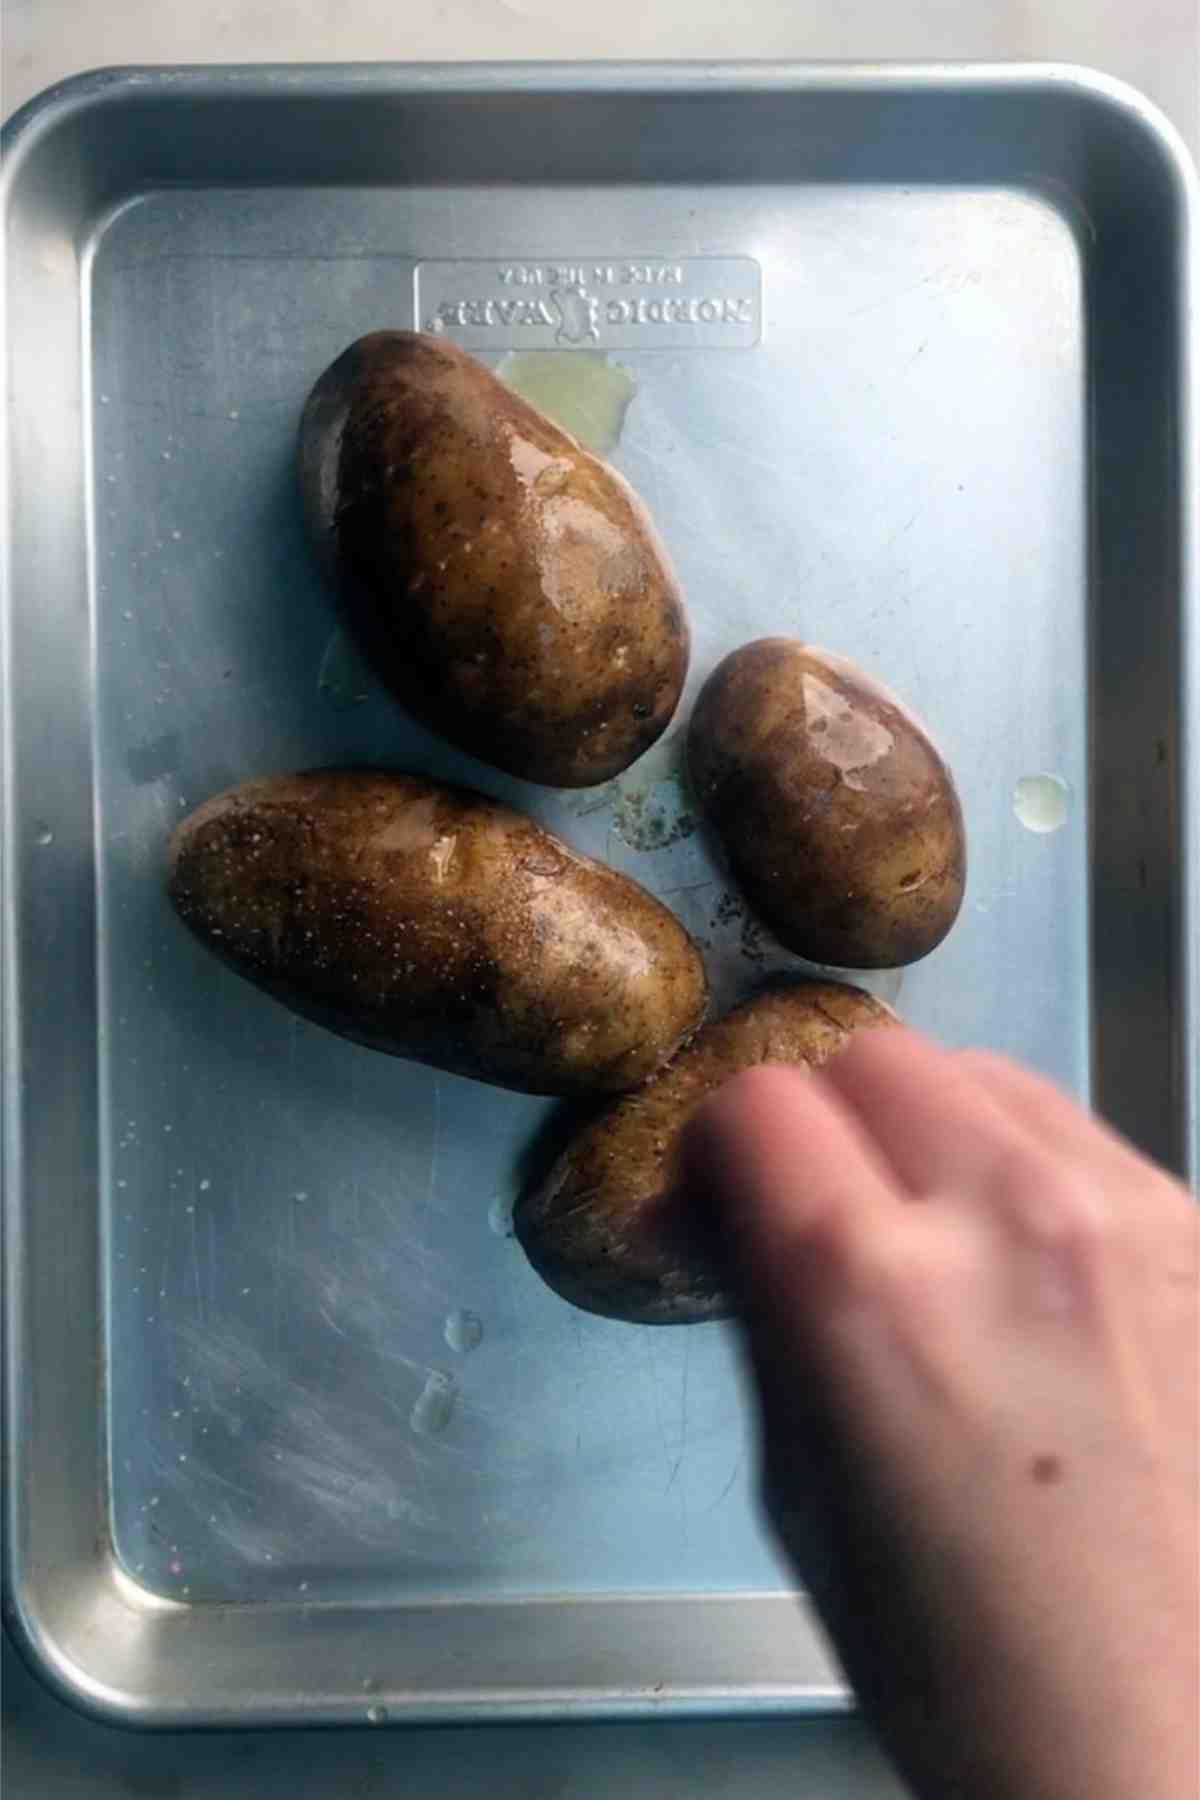 Potatoes on a baking sheet.